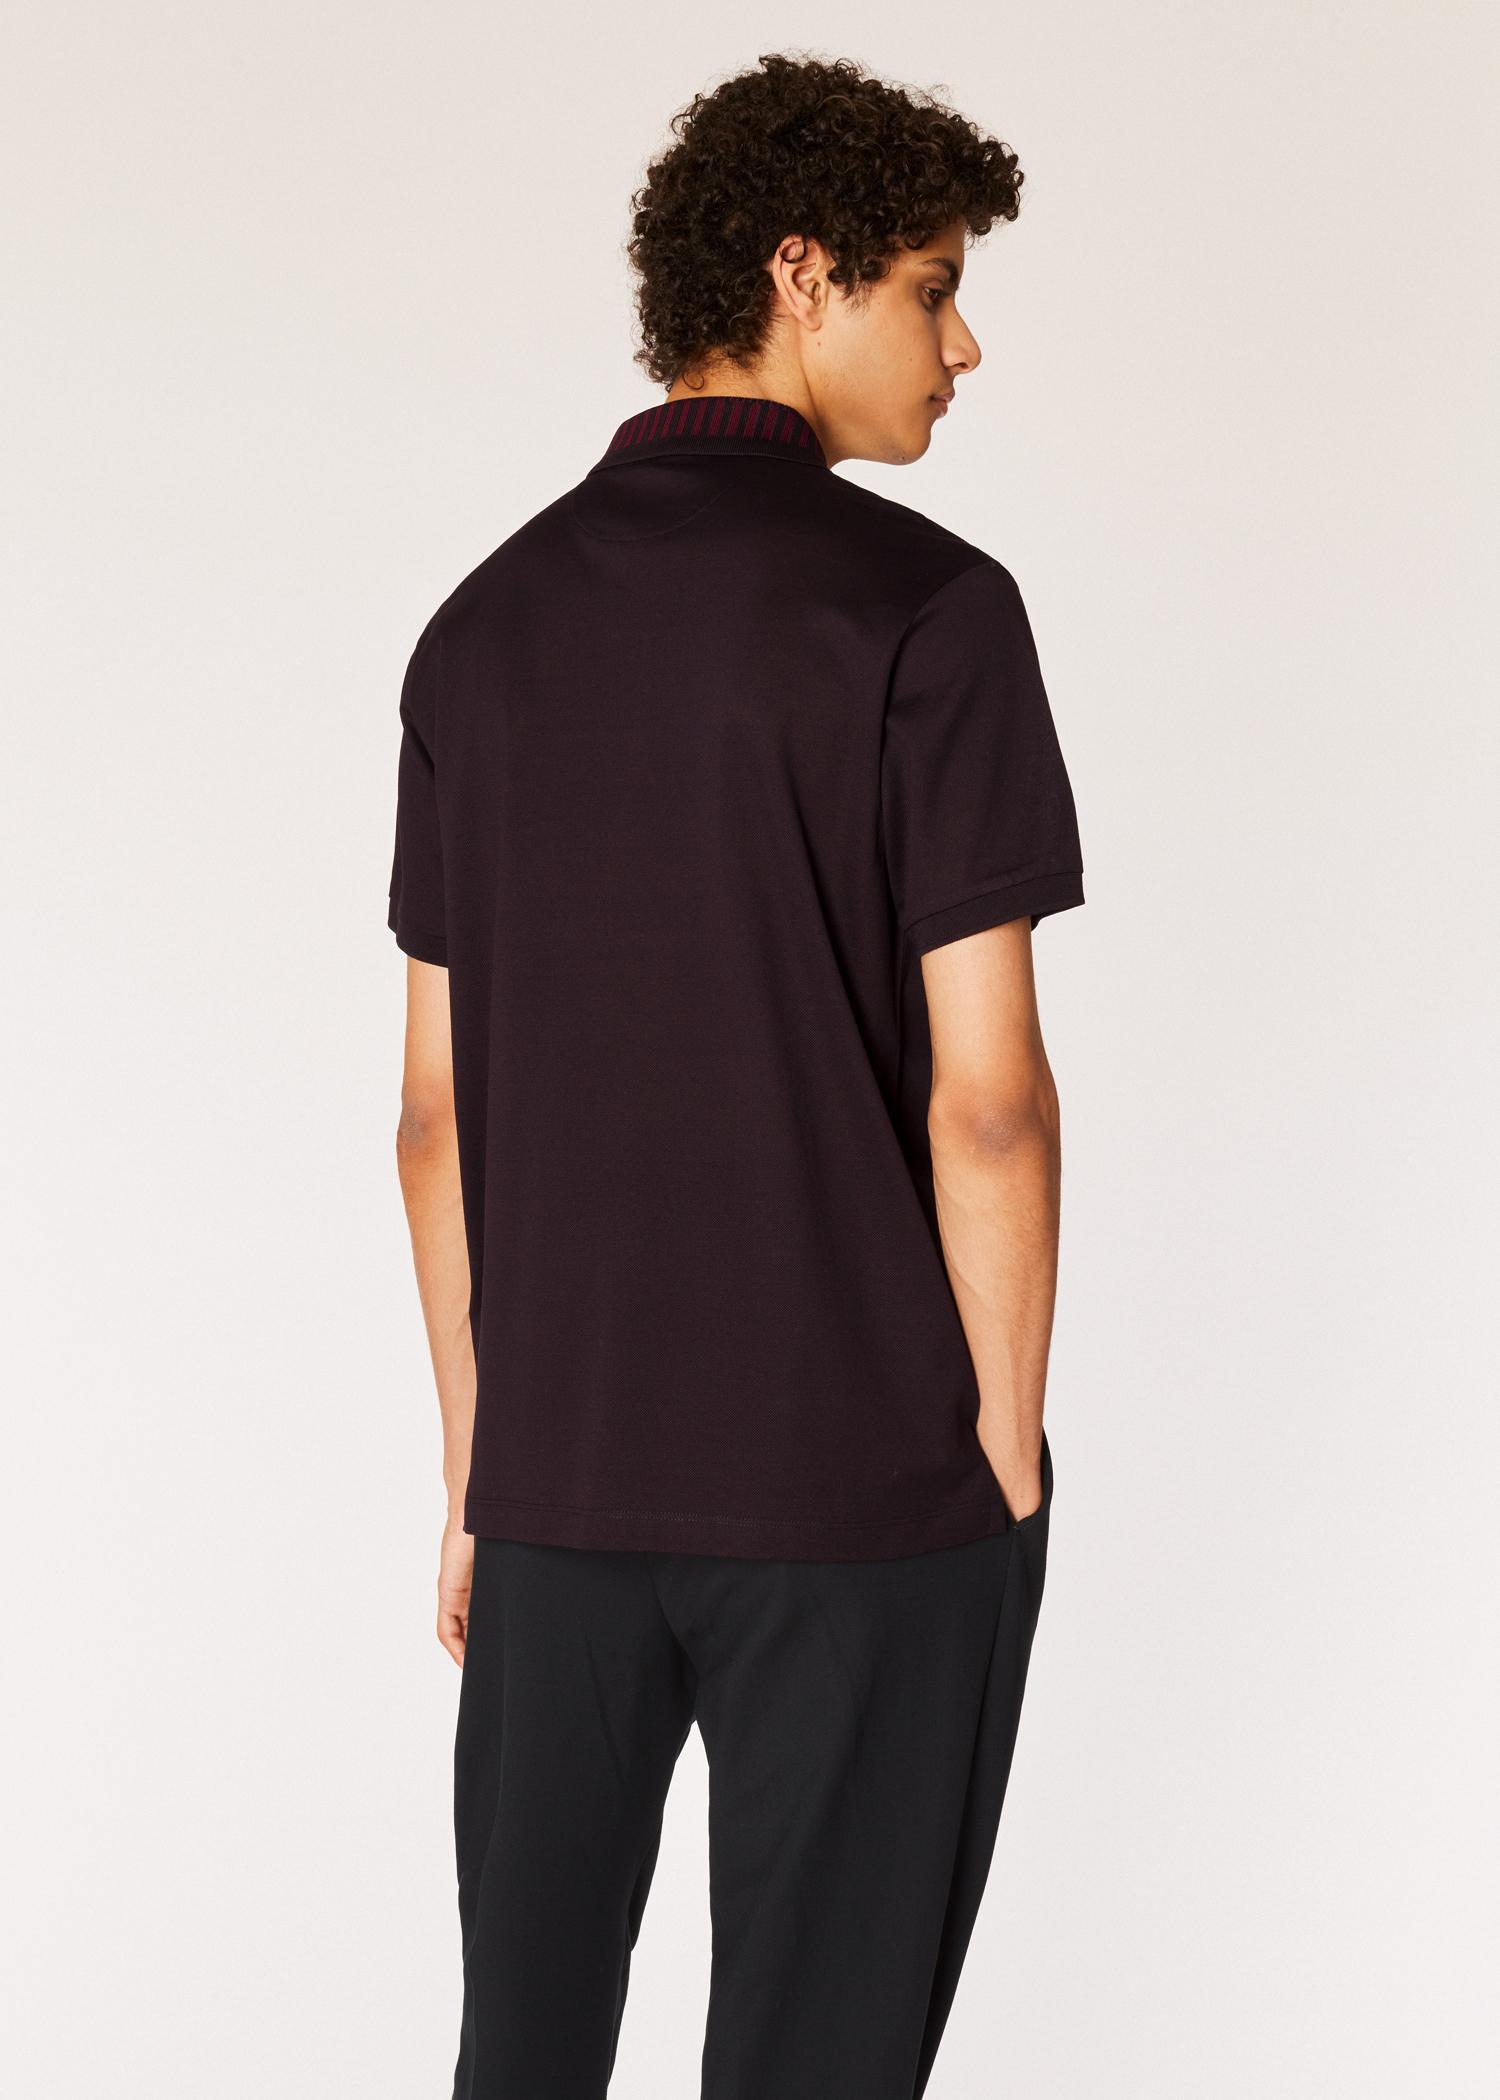 7532c9aad39e Model back close up - Men's Slim-Fit Dark Brown Cotton-Piqué Polo Shirt